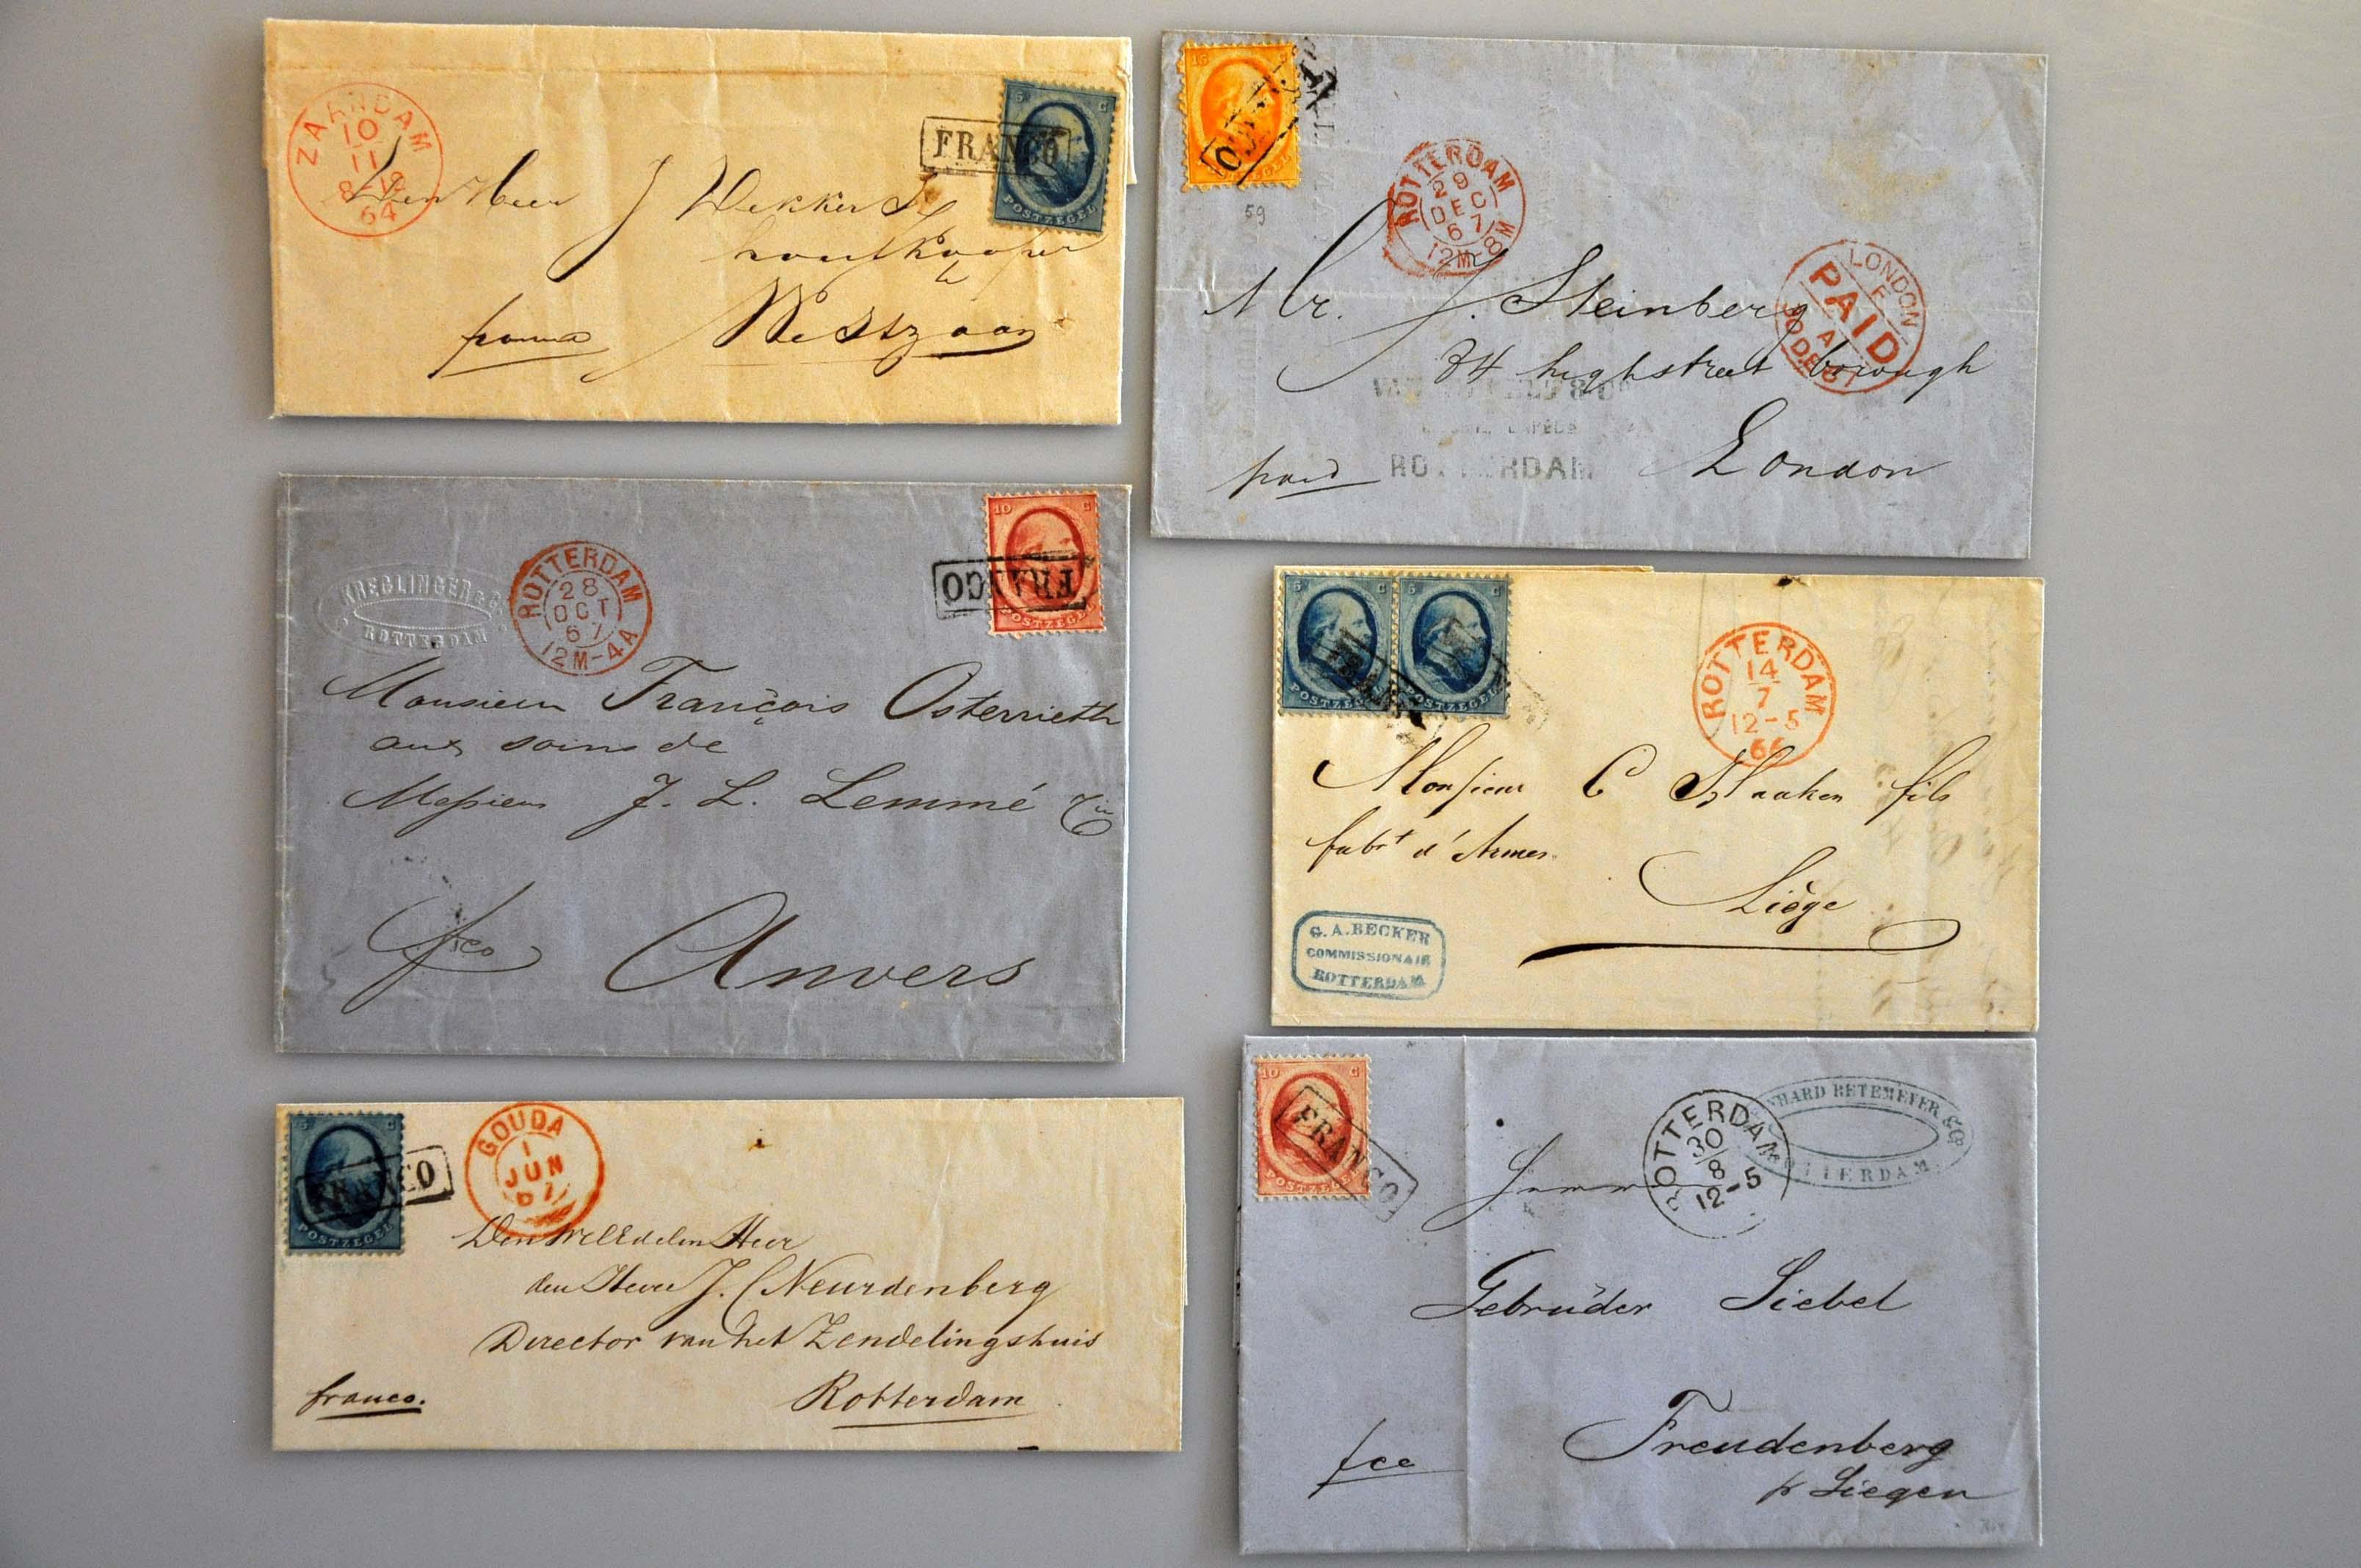 Lot 1474 - Netherlands and former colonies Netherlands -  Corinphila Veilingen Auction 239: General sale